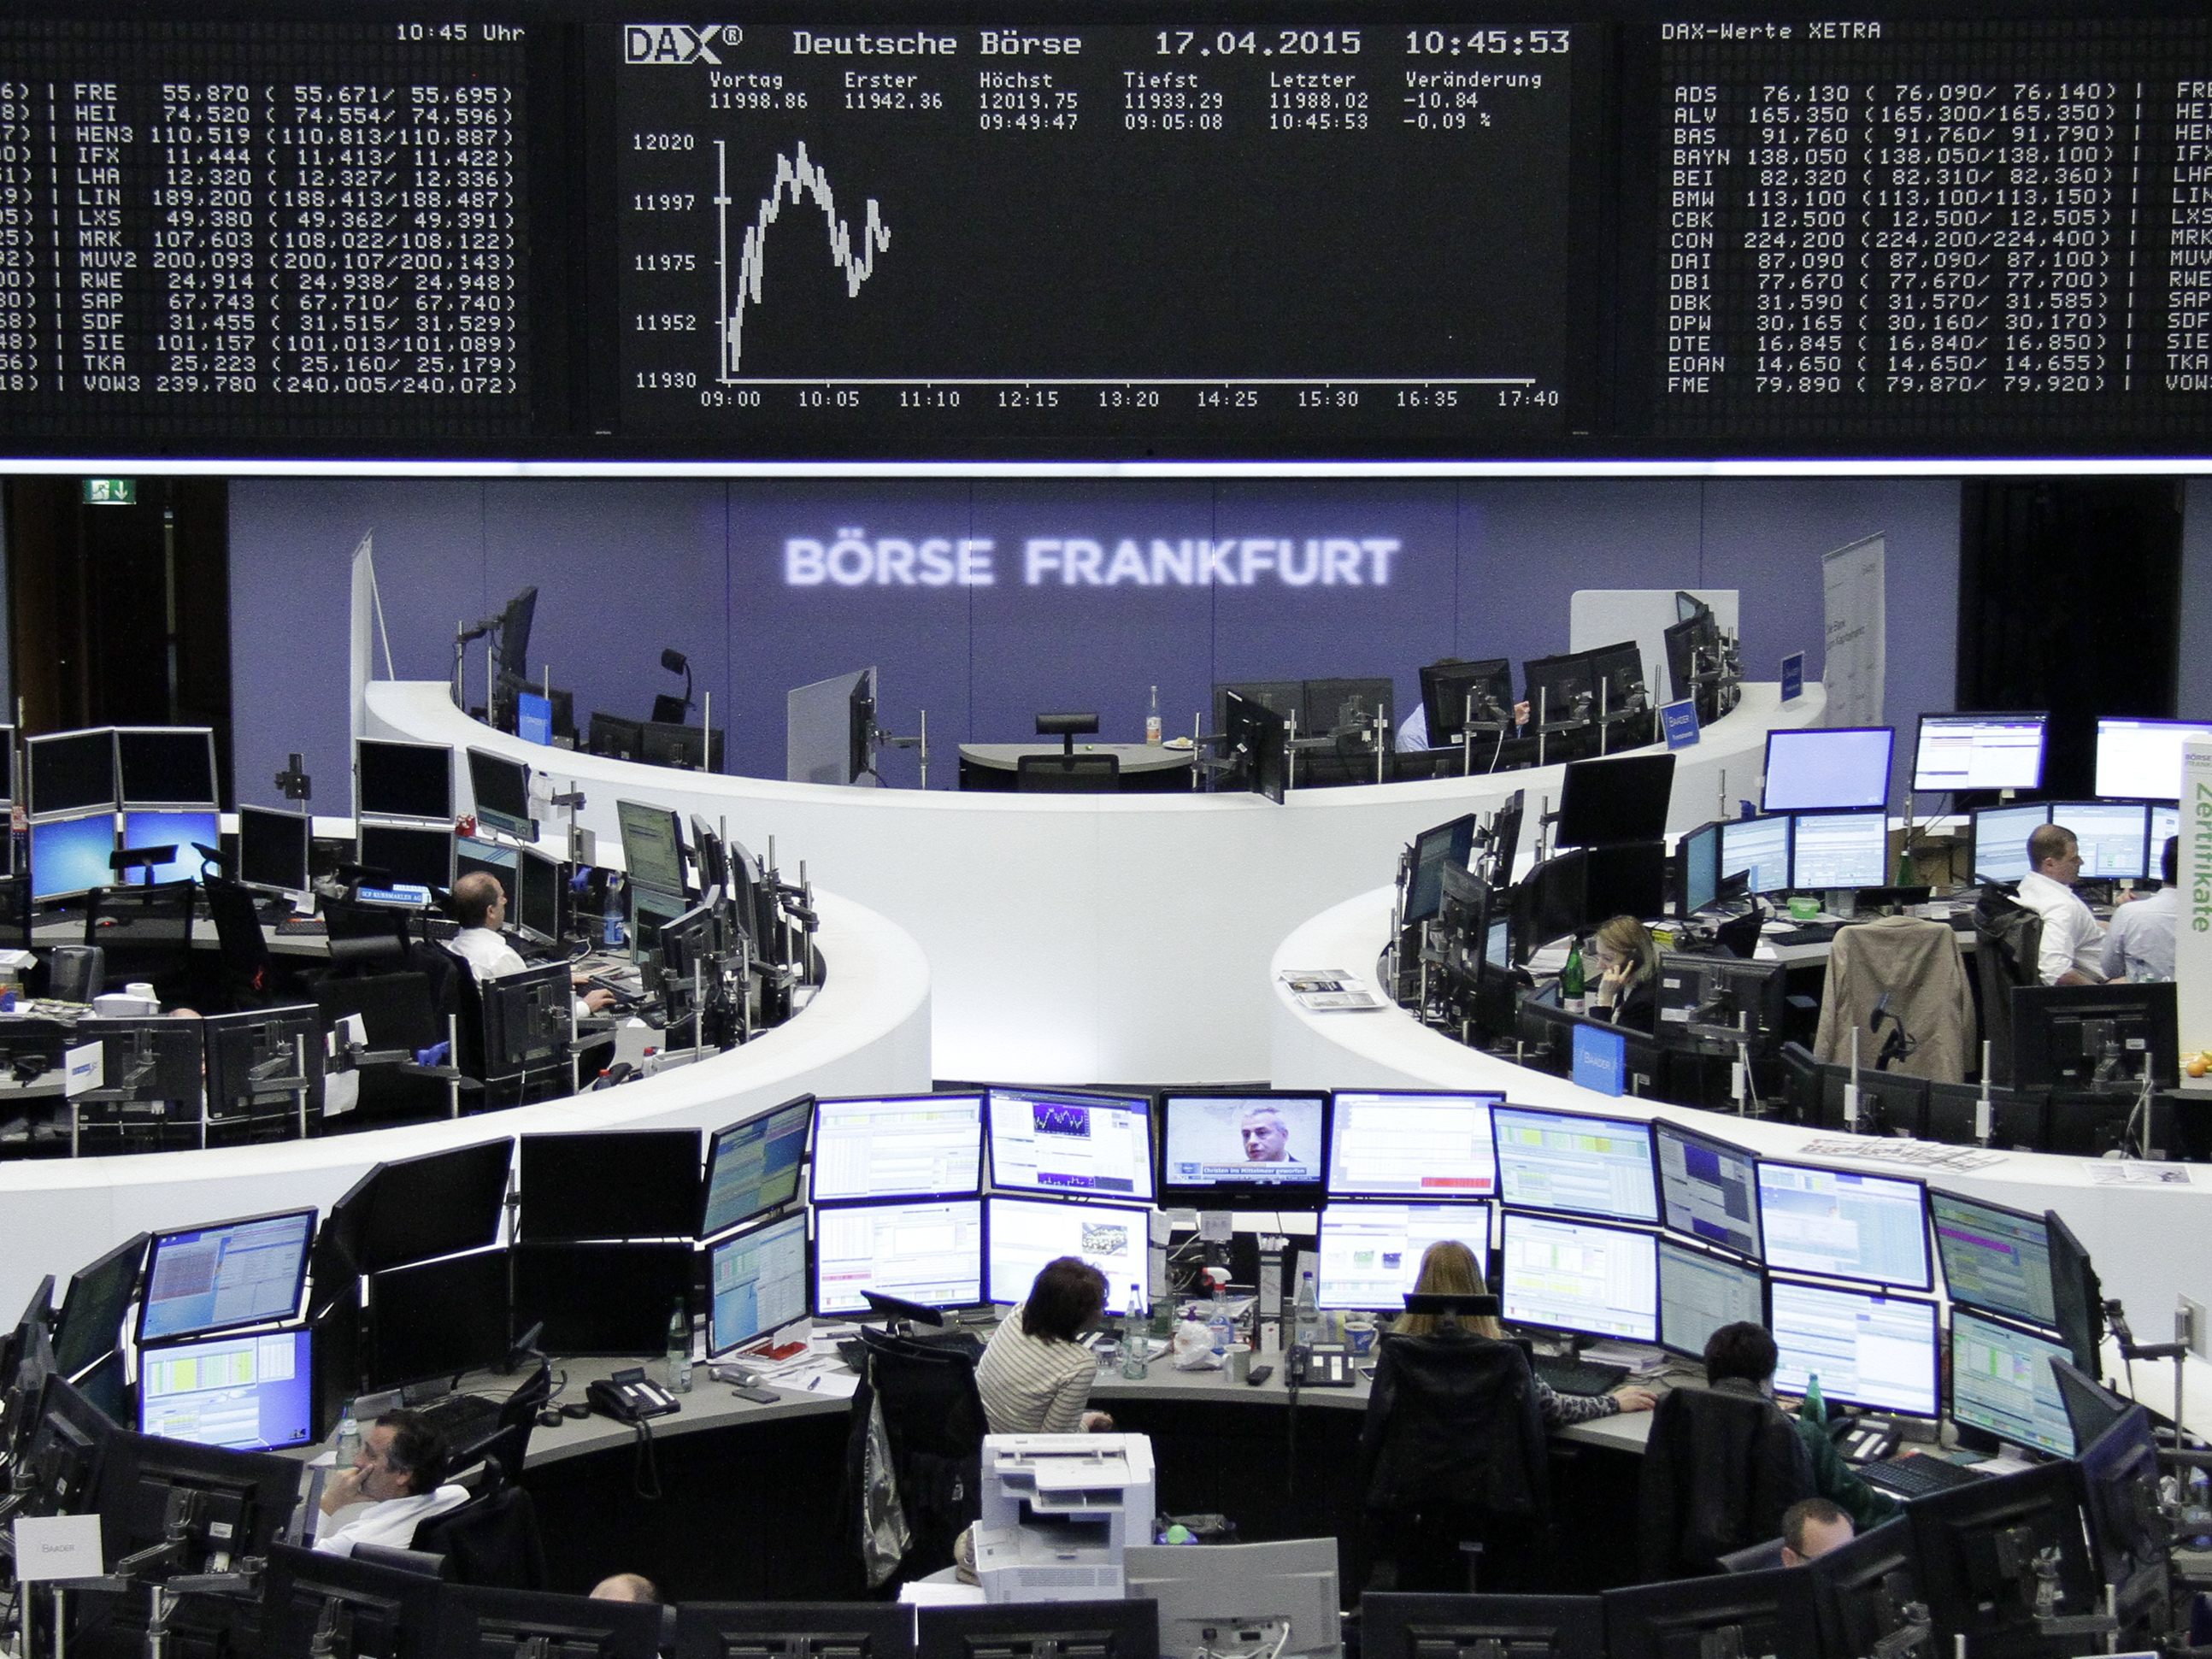 Bloomberg Terminals Go Dark For Hours, Sending Ripples Through Markets